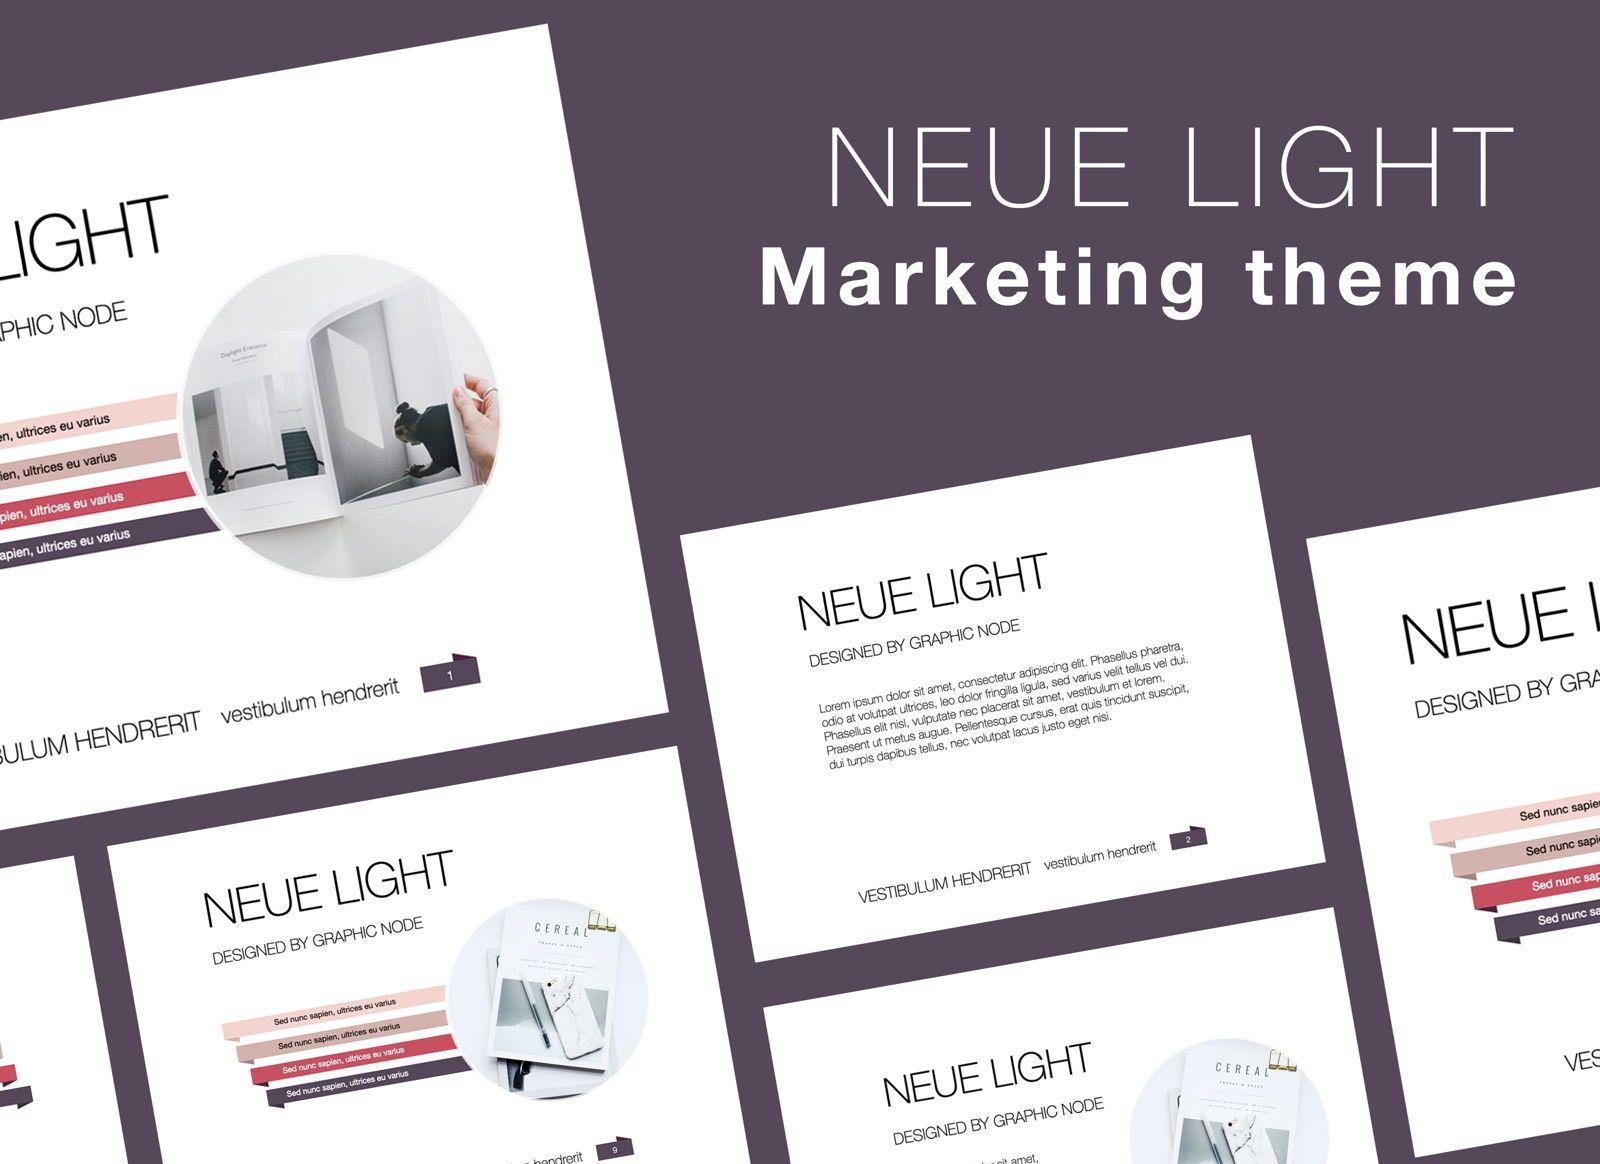 Neue Light Keynote Presentation Template, 07572, Presentation Templates — PoweredTemplate.com